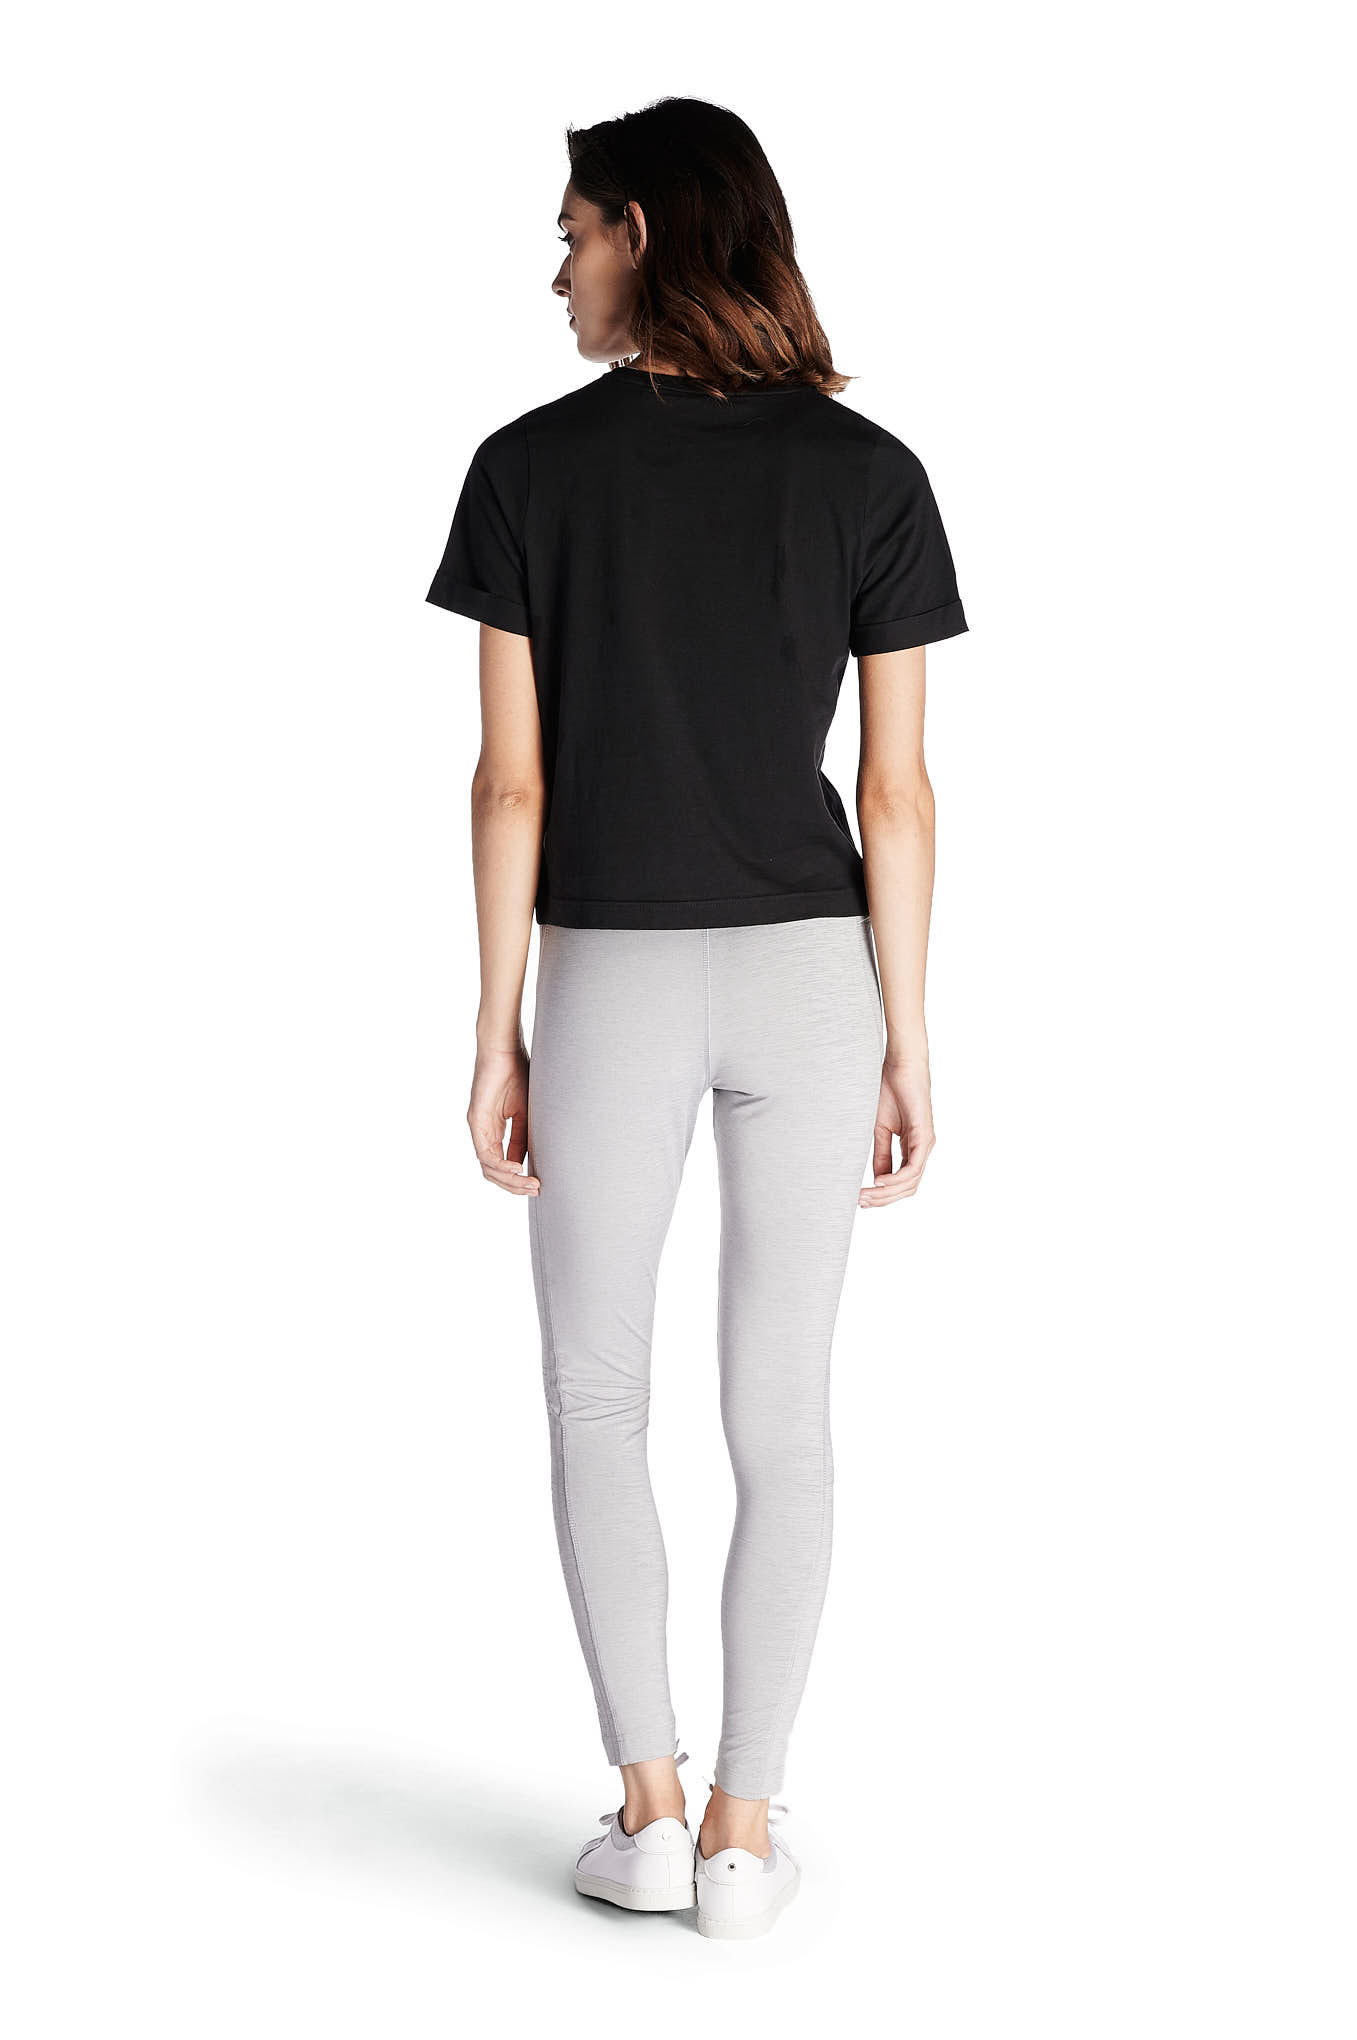 T-Shirt Black Sport Woman